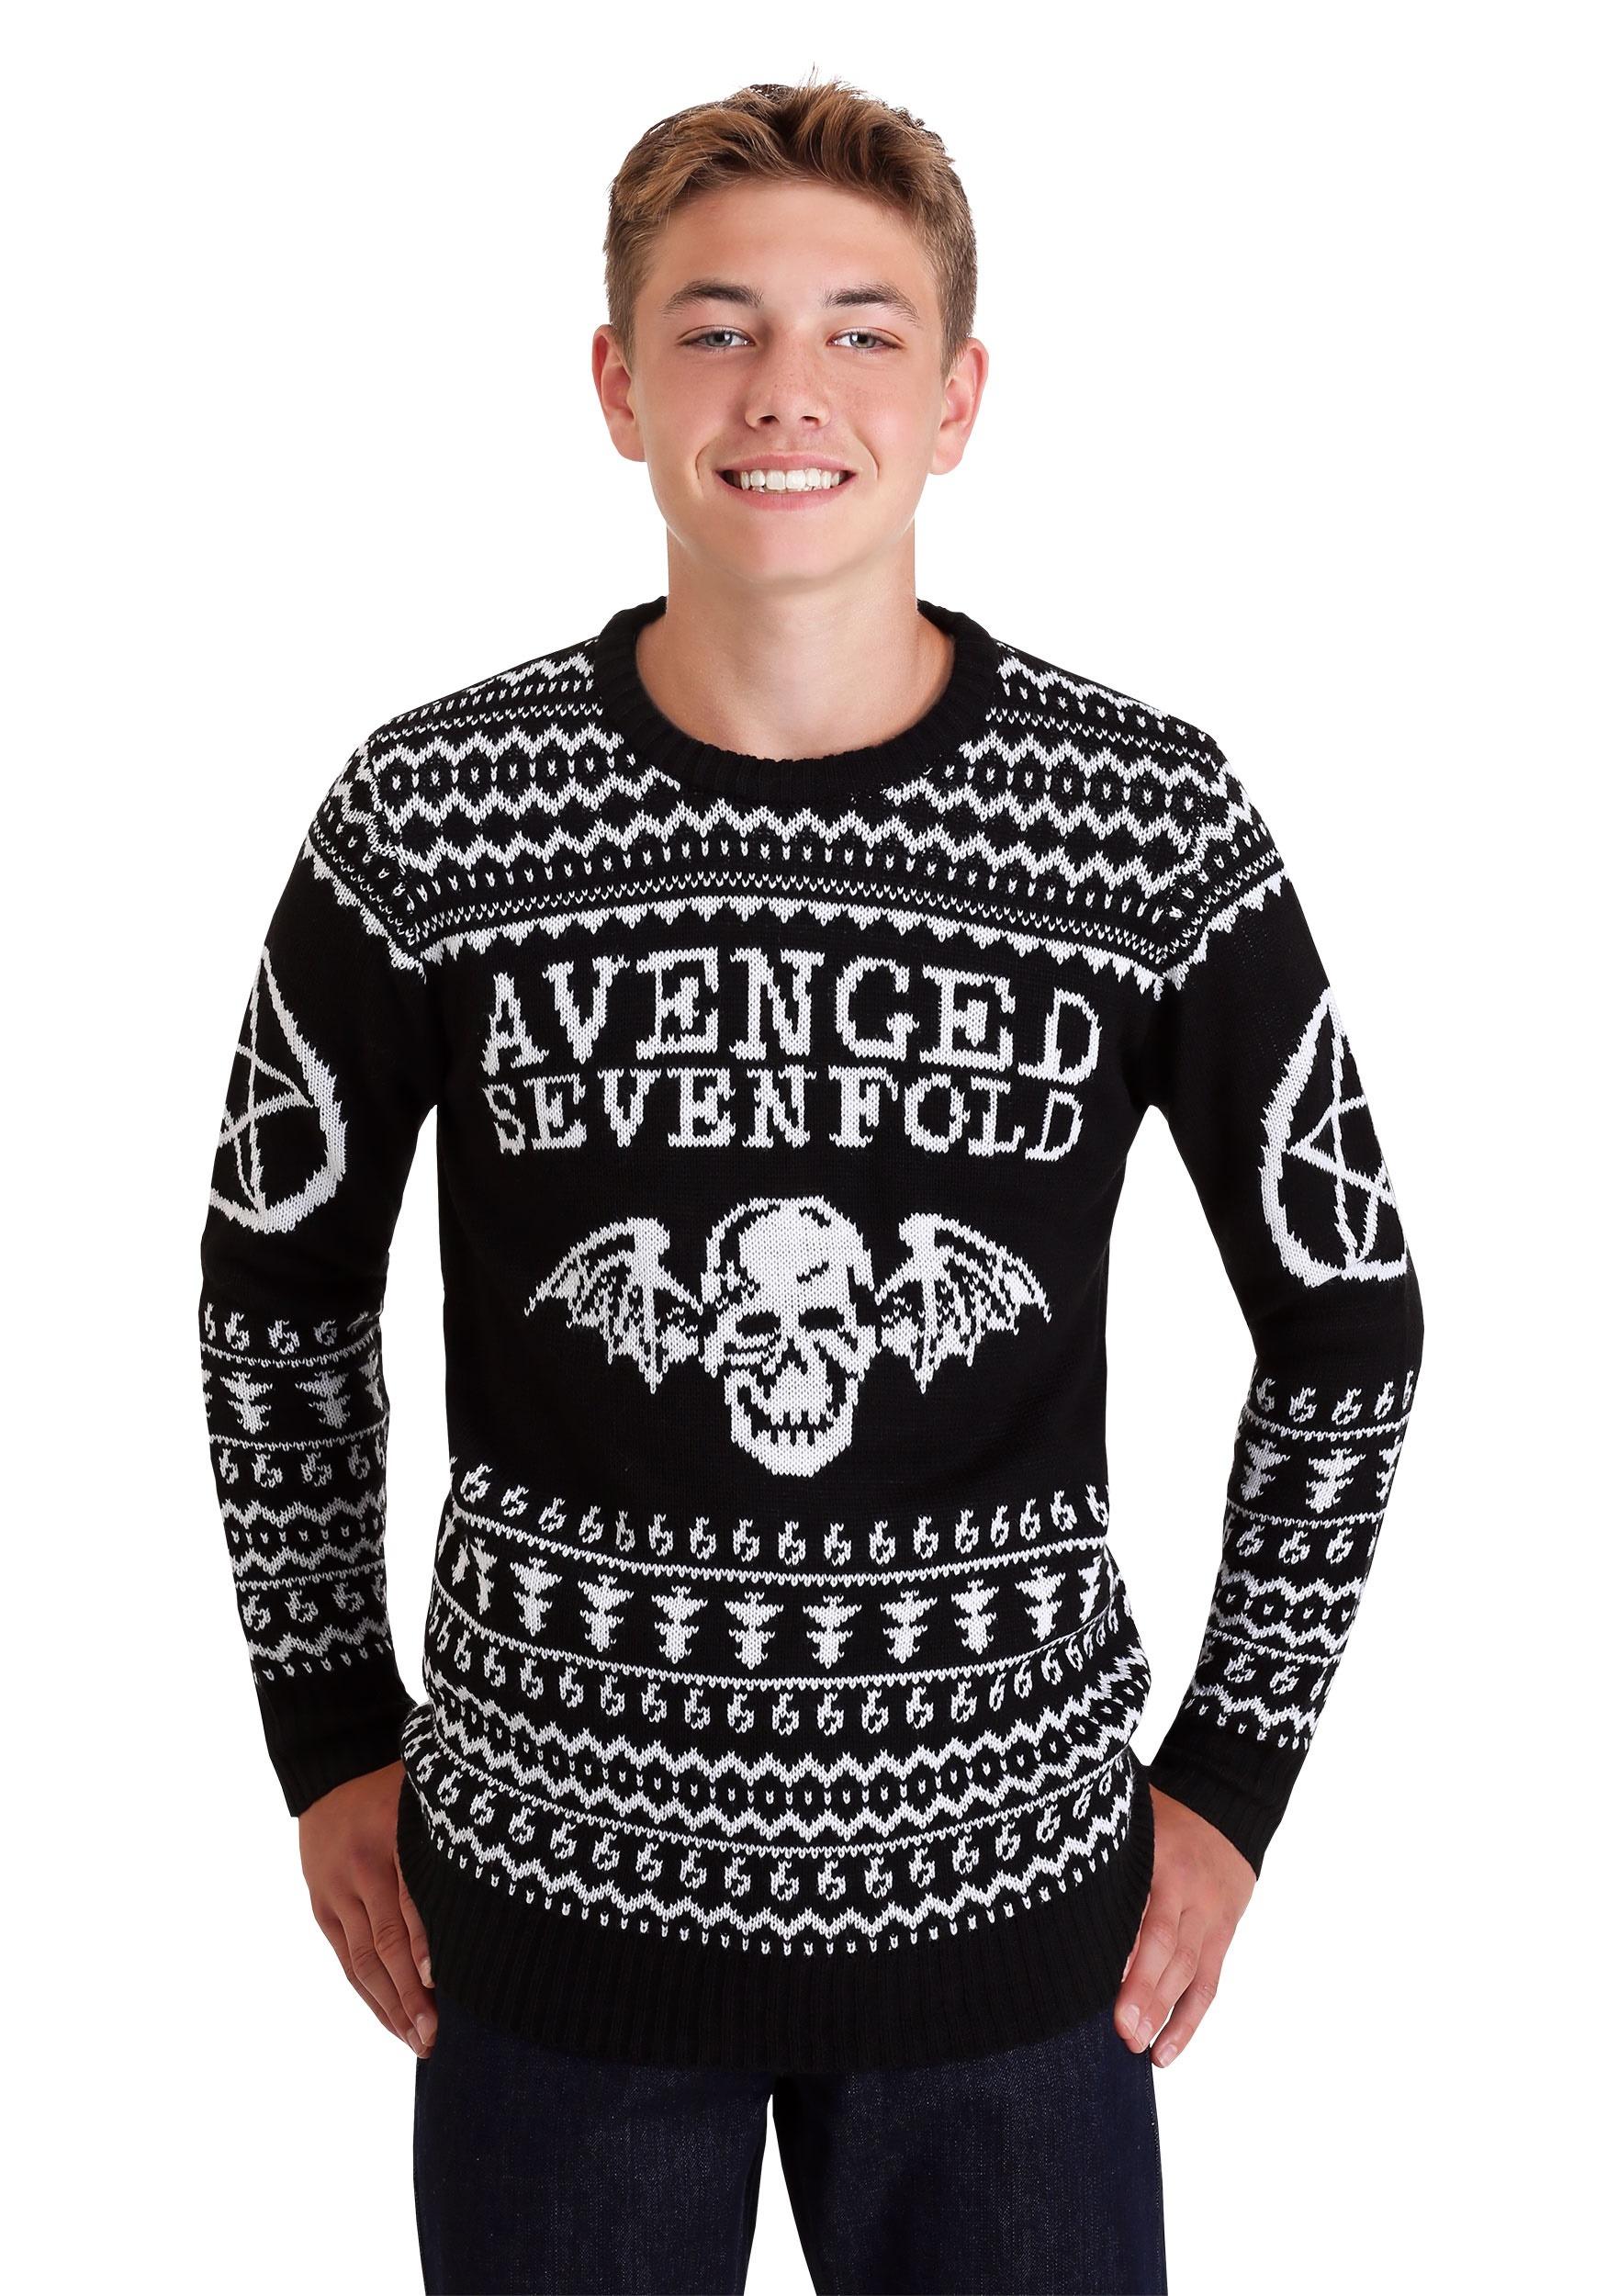 Christmas Ugly Sweater.Avenged Sevenfold Ugly Christmas Sweater